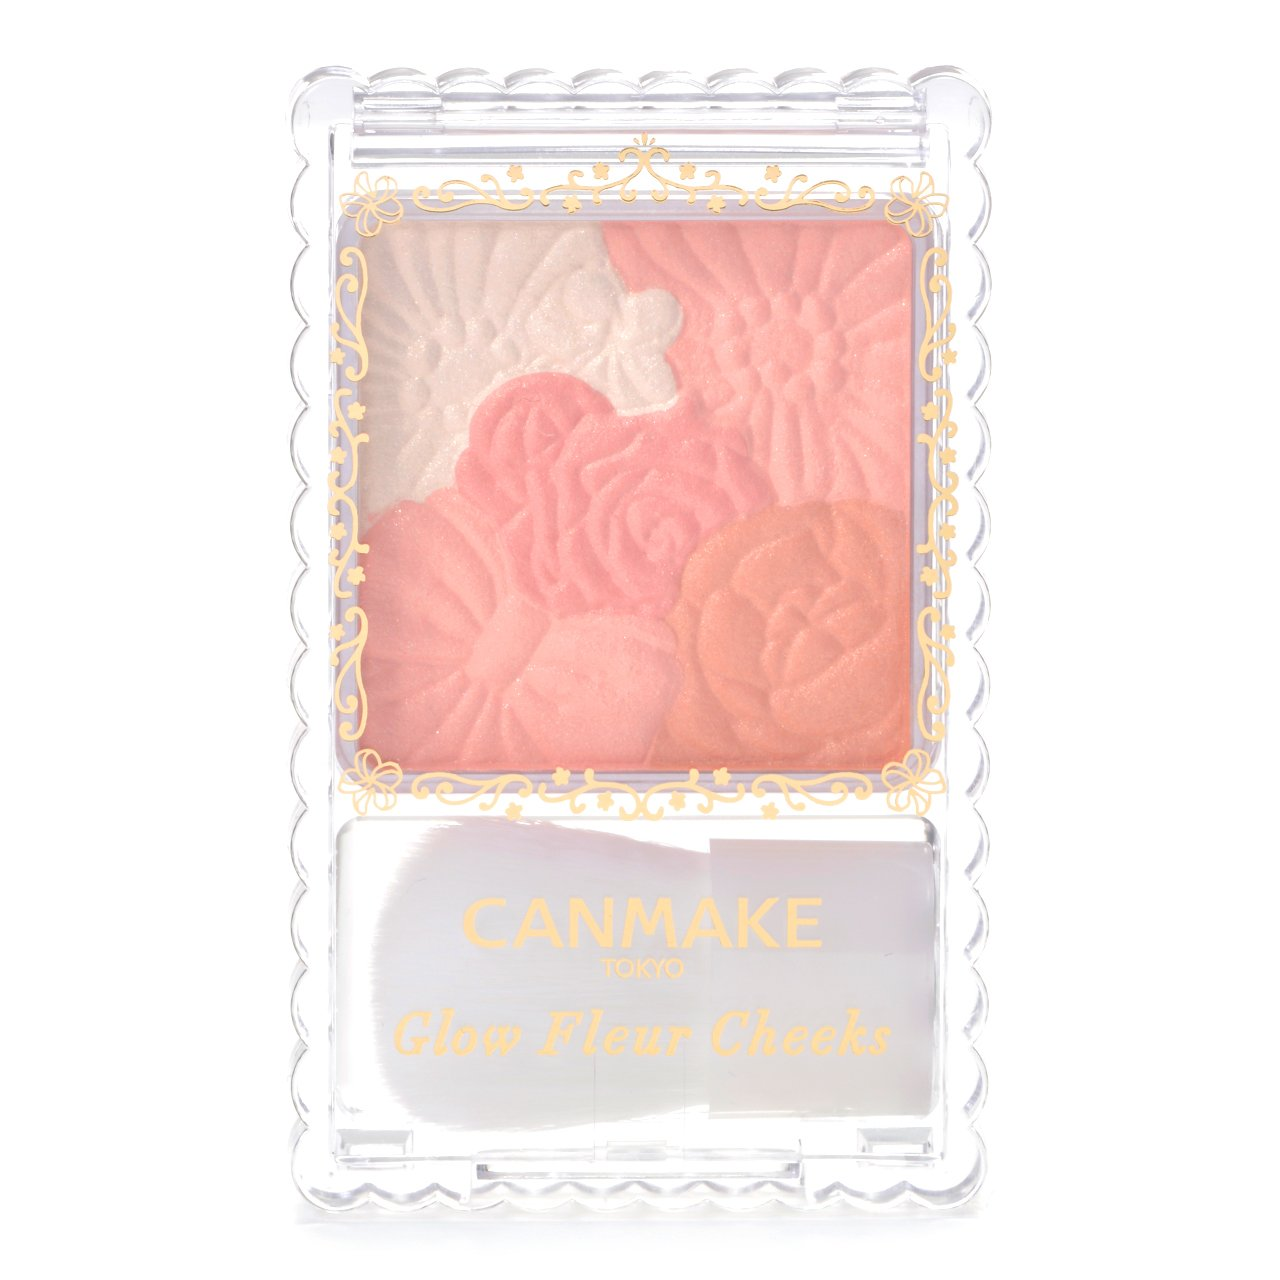 CANMAKE Glow Fleur CHeeks 03 Fairy Orange Fleur by CANMAKE 4901008307015